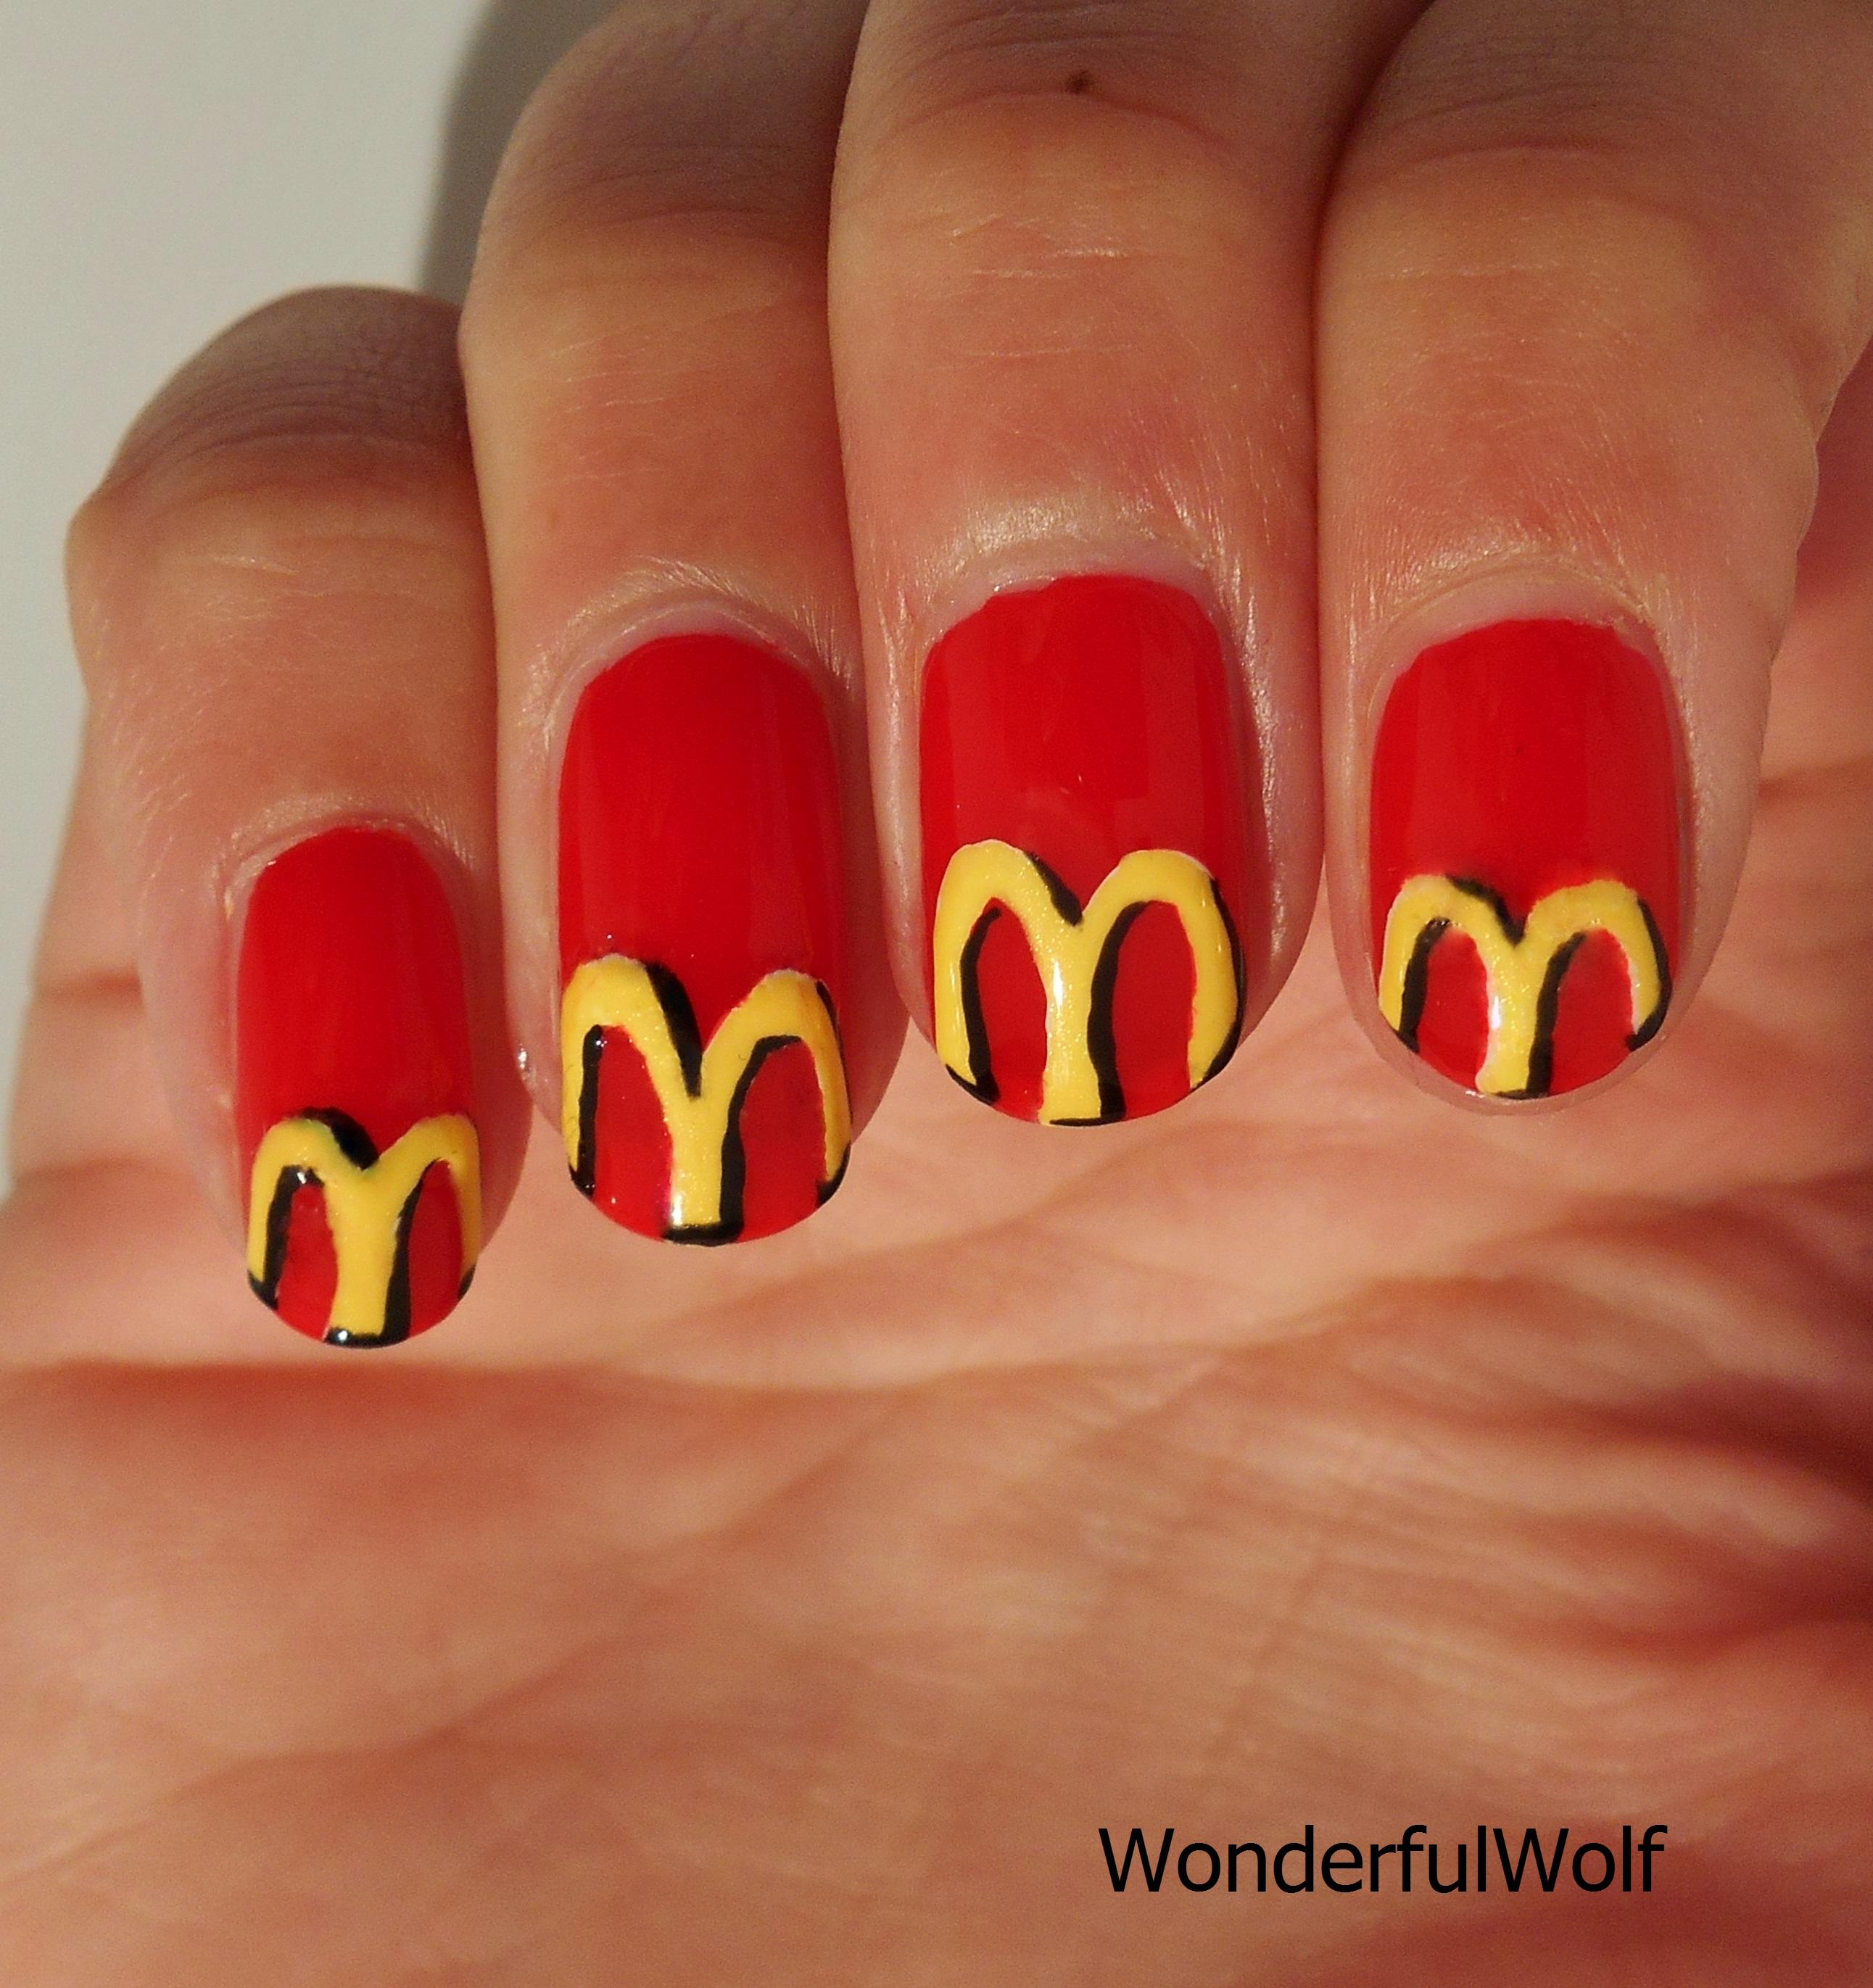 OMD3 Nail Art – WonderfulWolf